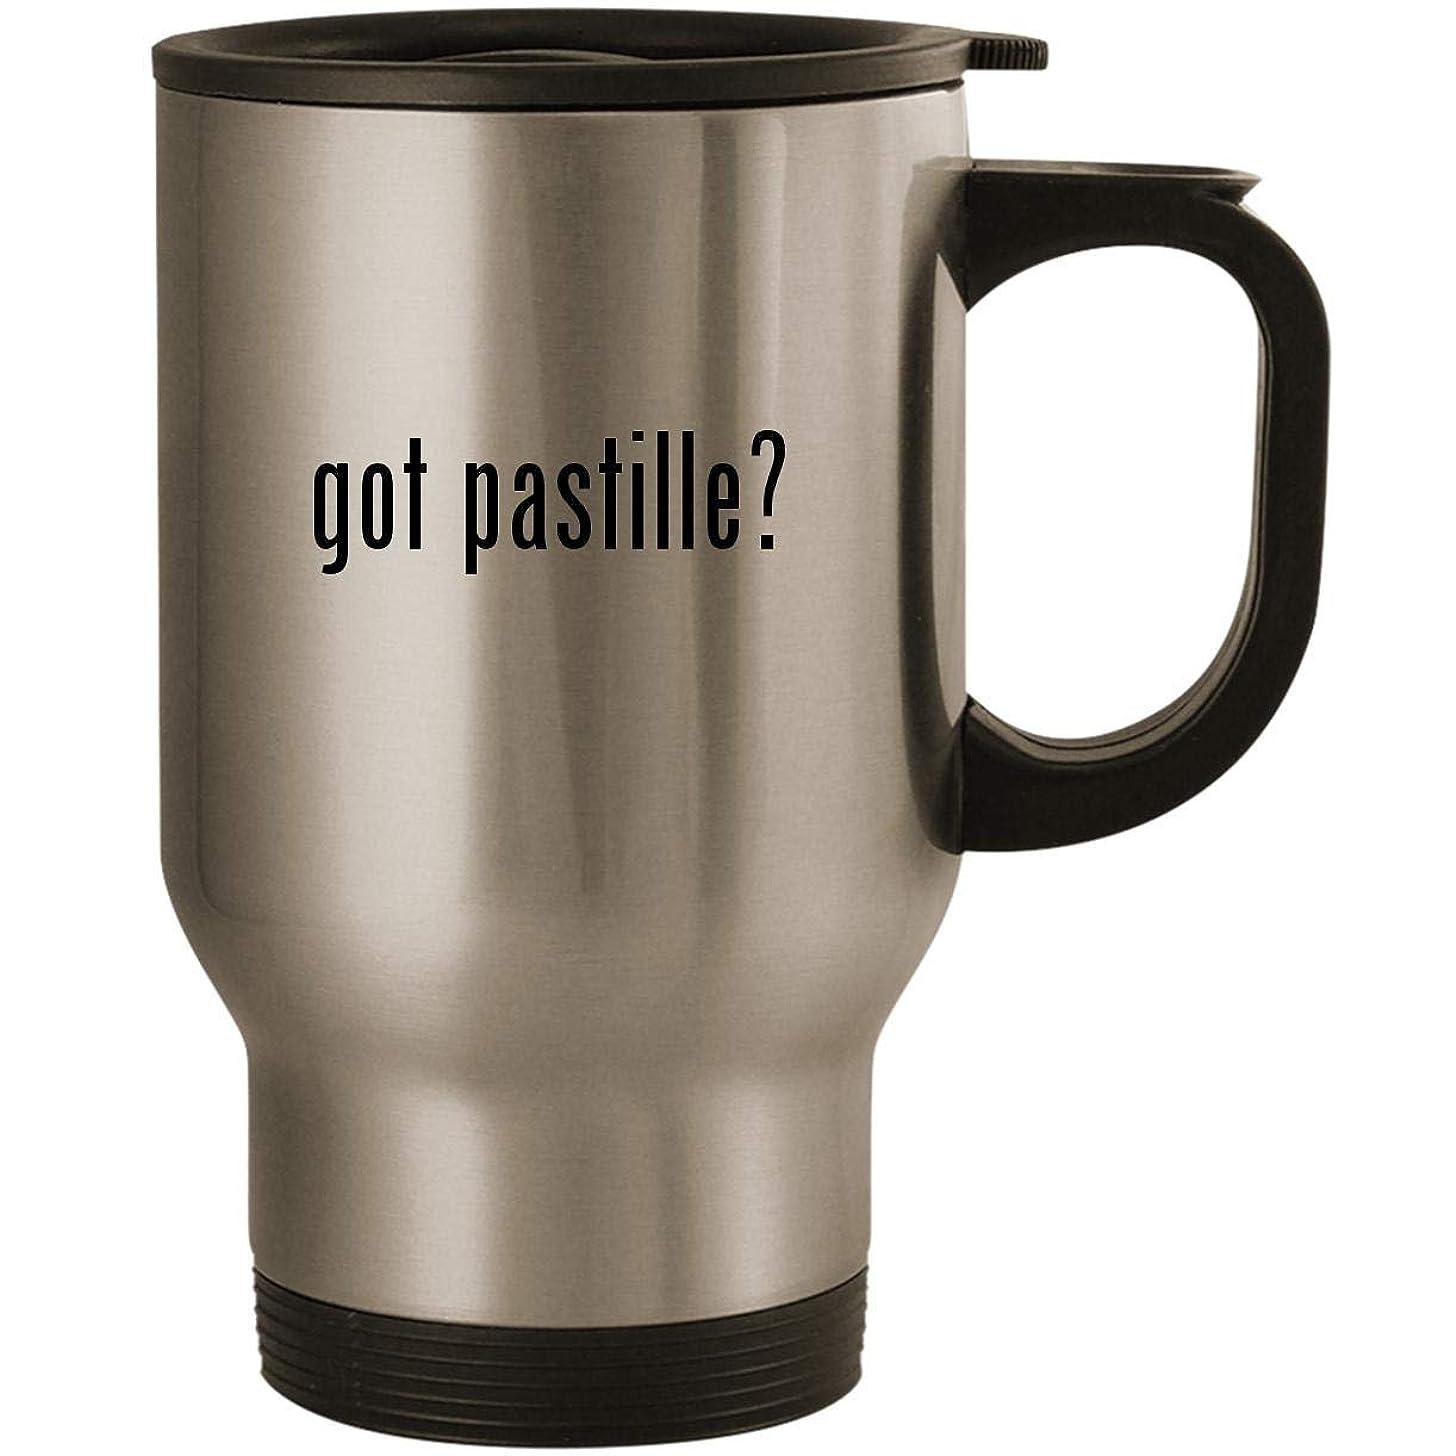 got pastille? - Stainless Steel 14oz Road Ready Travel Mug, Silver